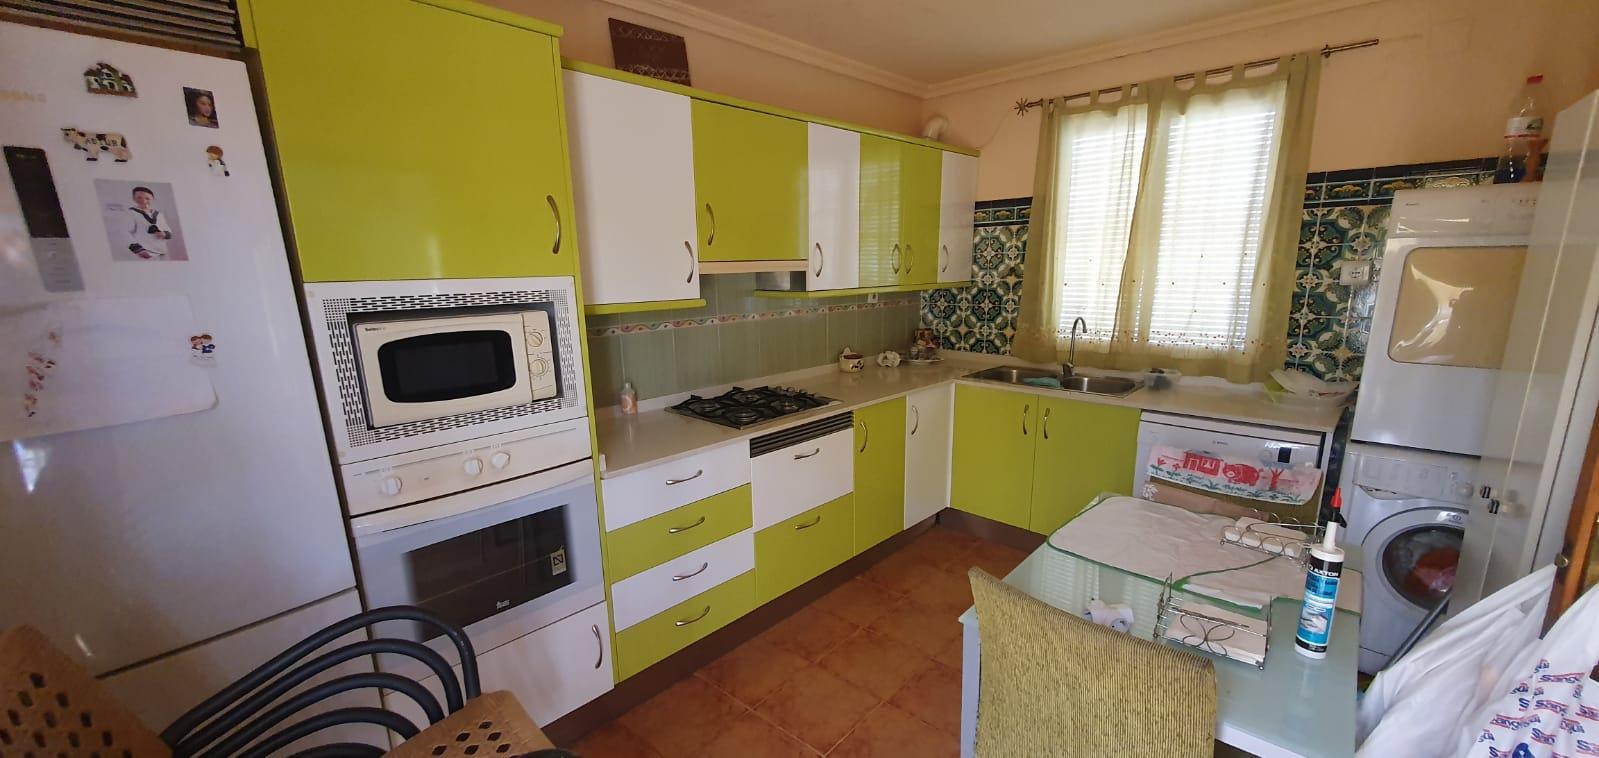 kf943697: Country House or Finca for sale in Puebla de Soto